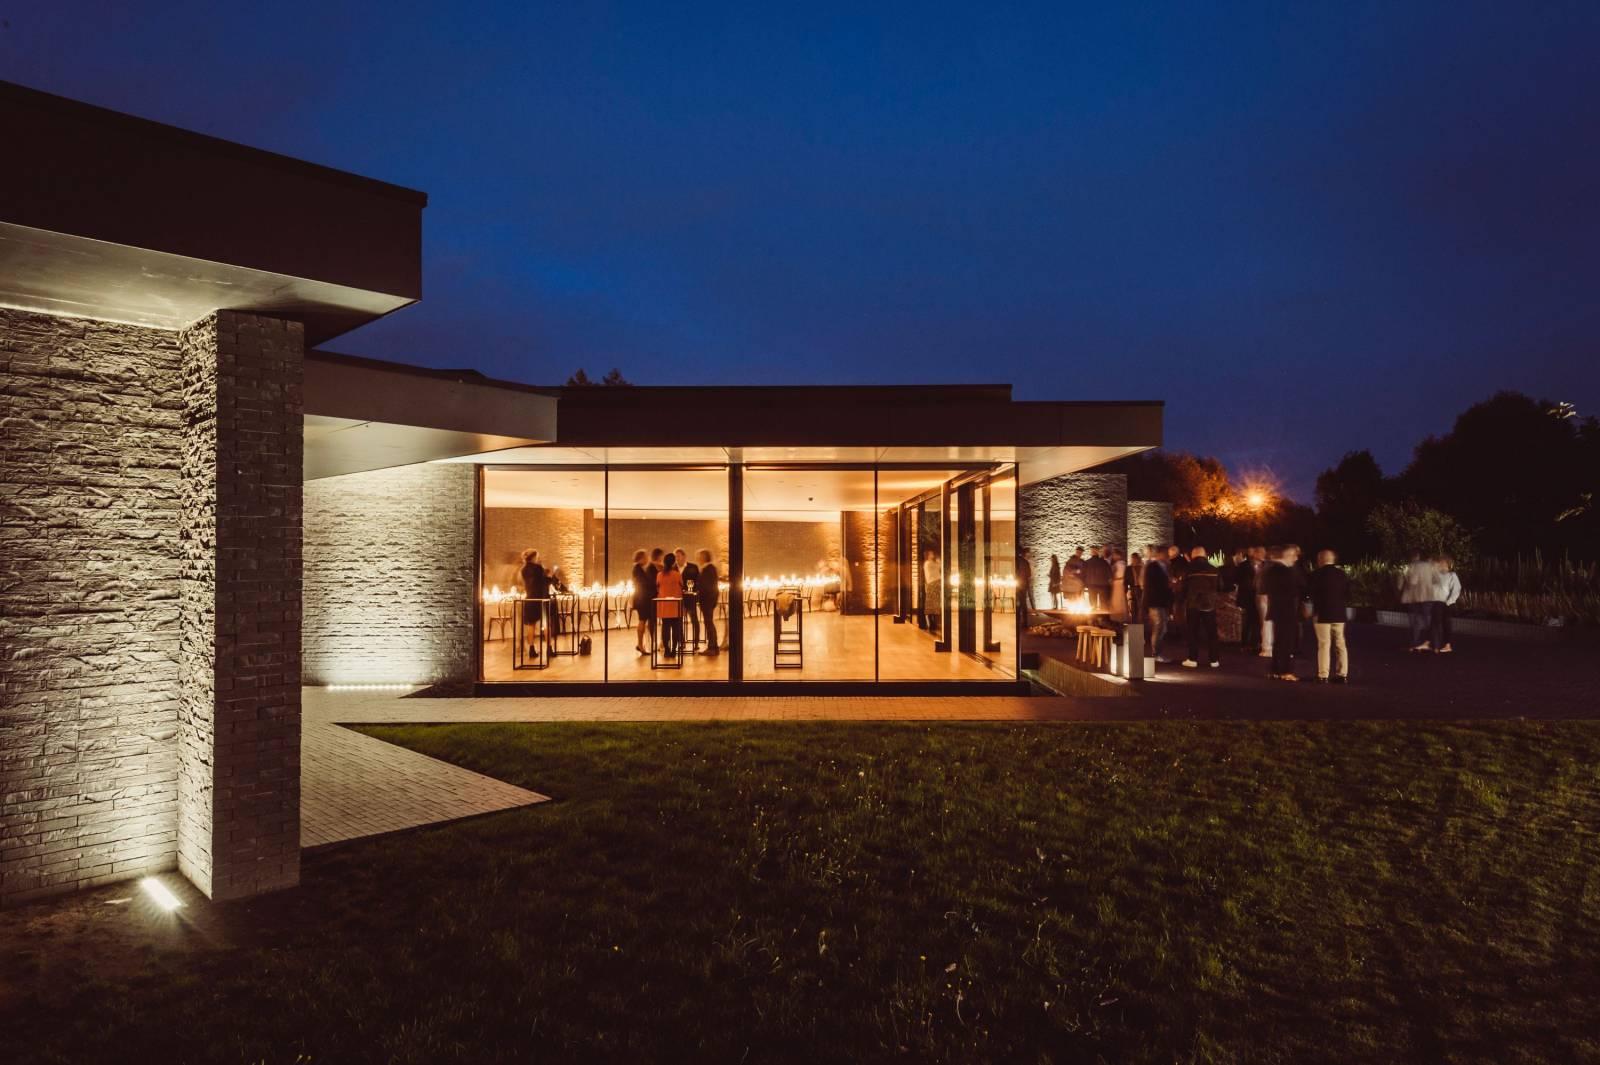 Hertog Jan - Feestzaal - Trouwzaal - House of Weddings - 12